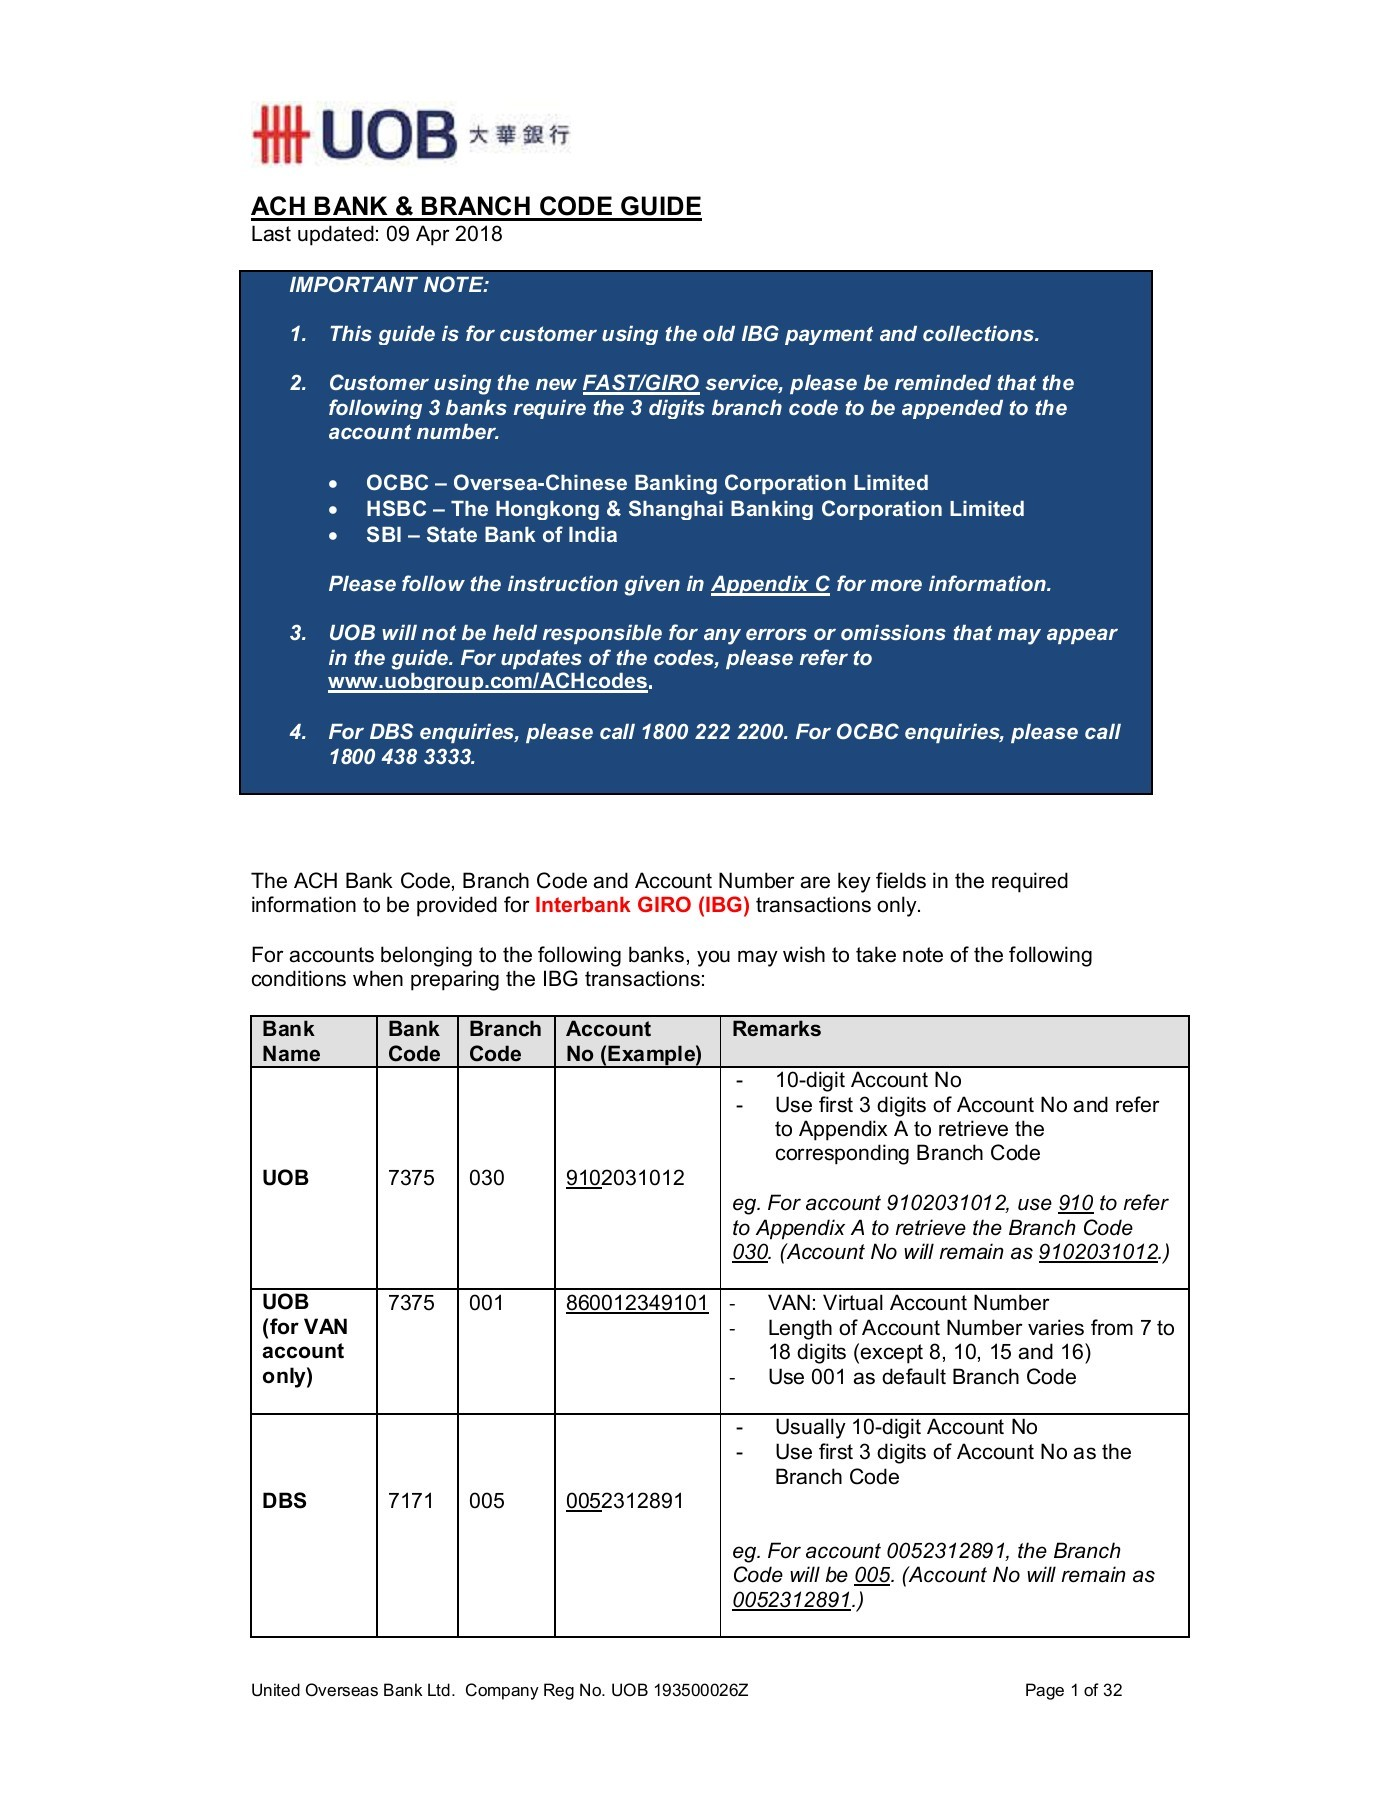 Sg Account Number Format Pages 1 32 Flip Pdf Download Fliphtml5